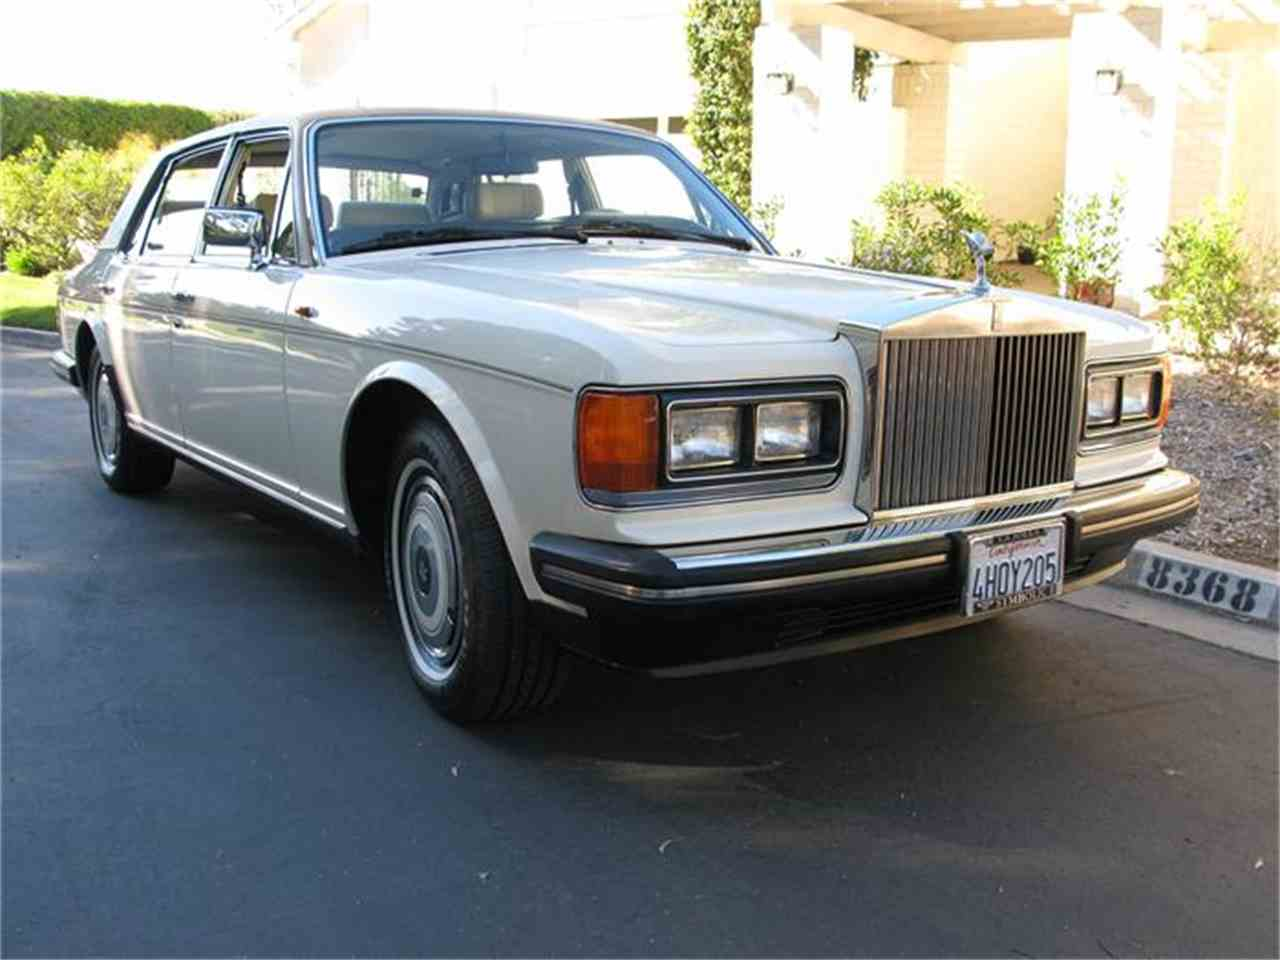 Large Picture of 1988 Rolls Royce Silver Spur - $25,000.00 - 6IIU